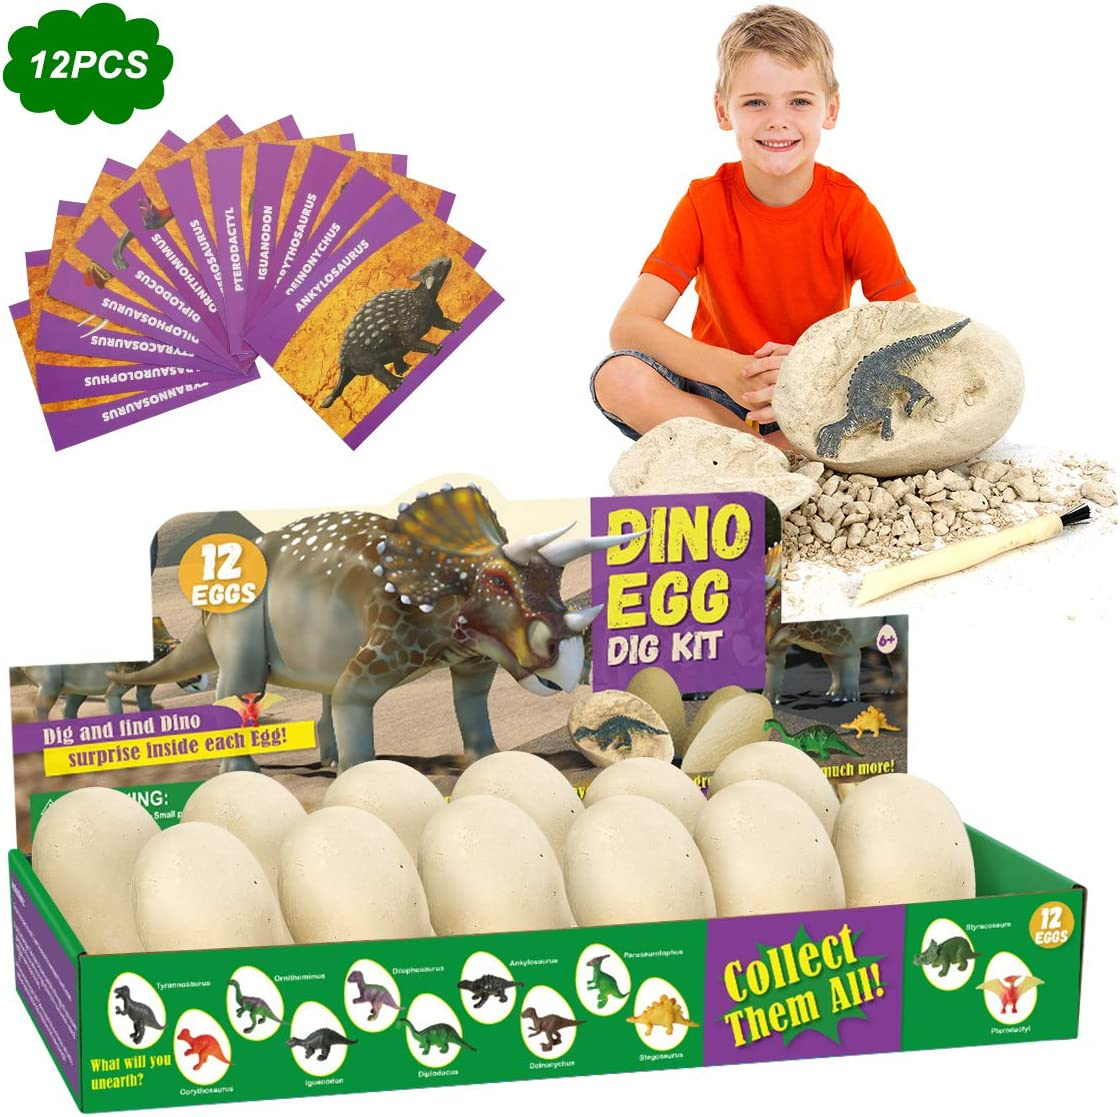 E-More Huevos de Dinosaurio de Kit de Excavación Paquete de 12, Descubre 12 Dinosaurios Diferentes, Fiesta de Pascua de Juguete Stem Juguetes Educativos para Niños de 6+ Años Regalo de Niños Niñas